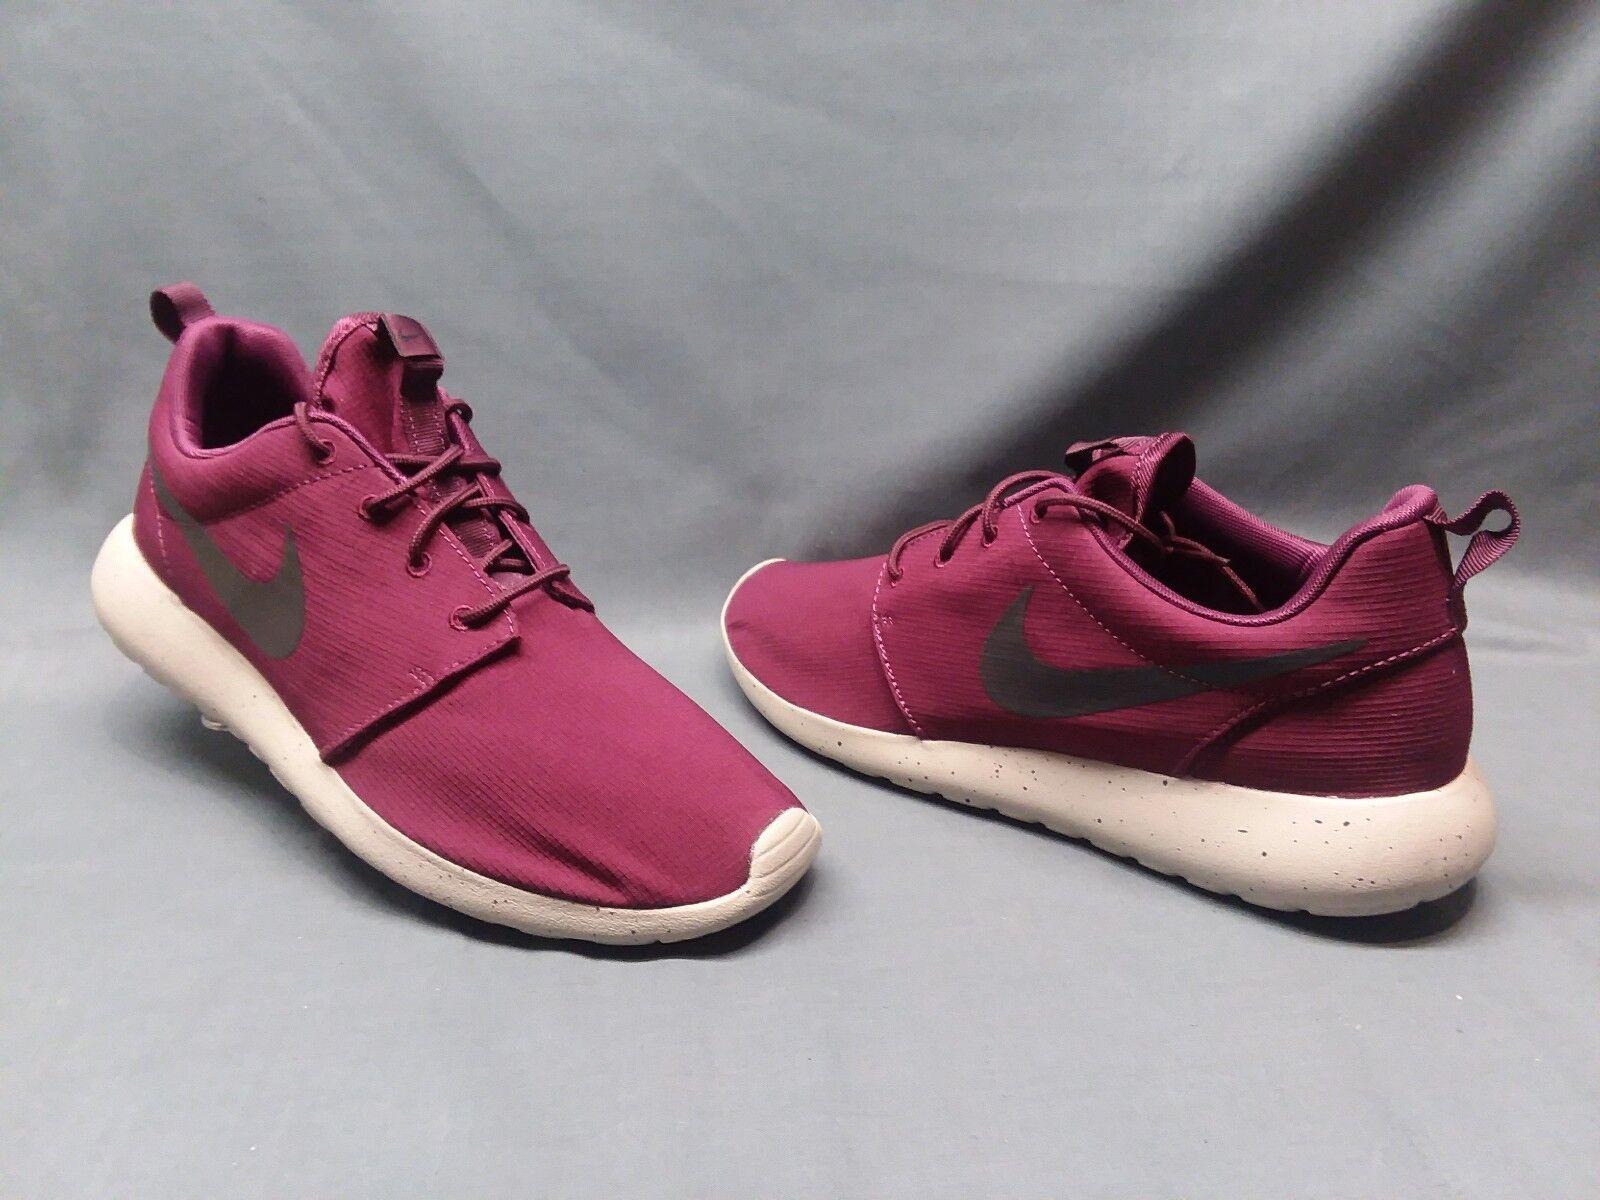 Privación desarrollando Campo  Nike Men's Roshe One SE Running Sneakers Mesh Bordeaux Pale Grey Size 13  NEW! for sale online